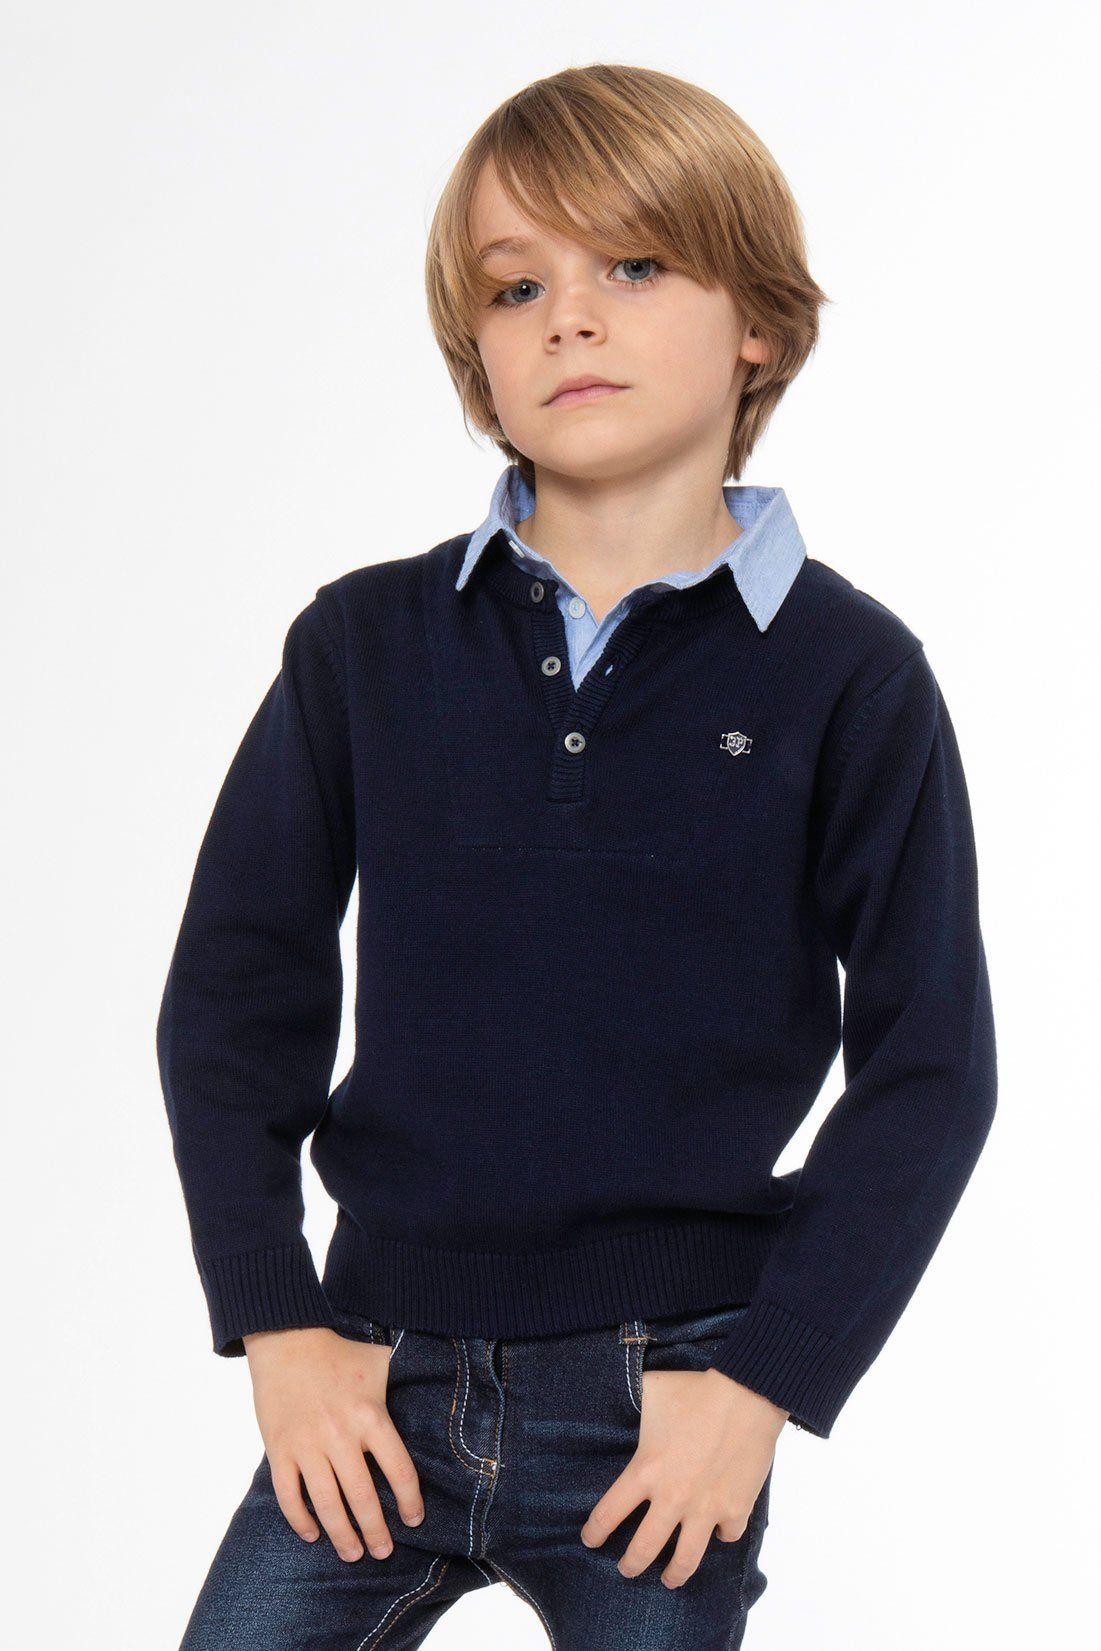 3pommes Navy Polo Boys Sweater - 5/6 / Navy